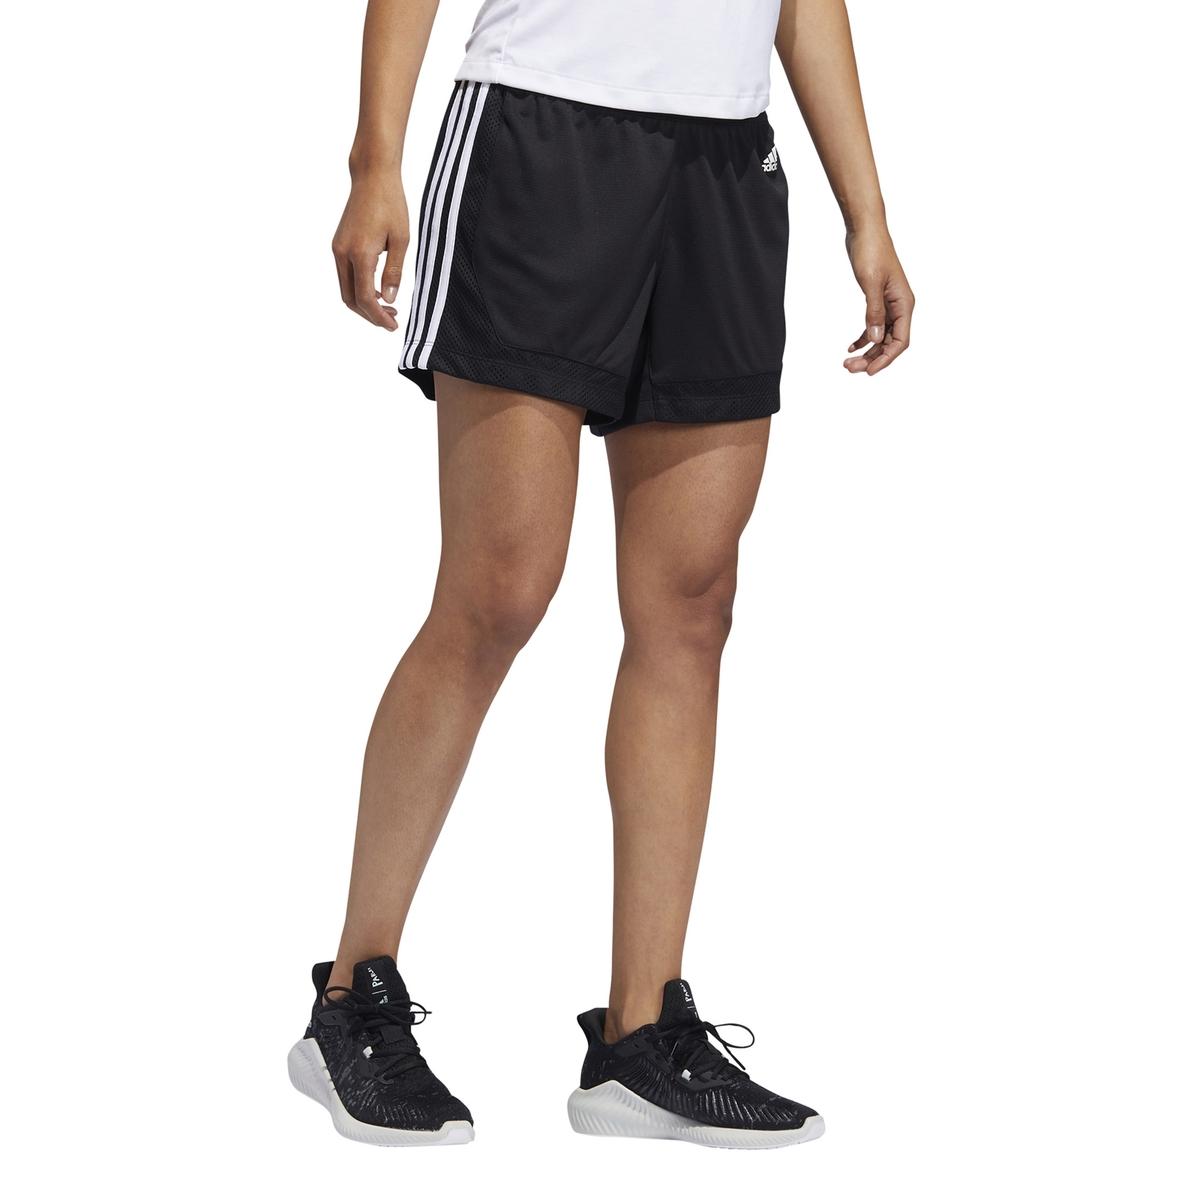 Short deportivo 3-stripes Mesh 5 inch